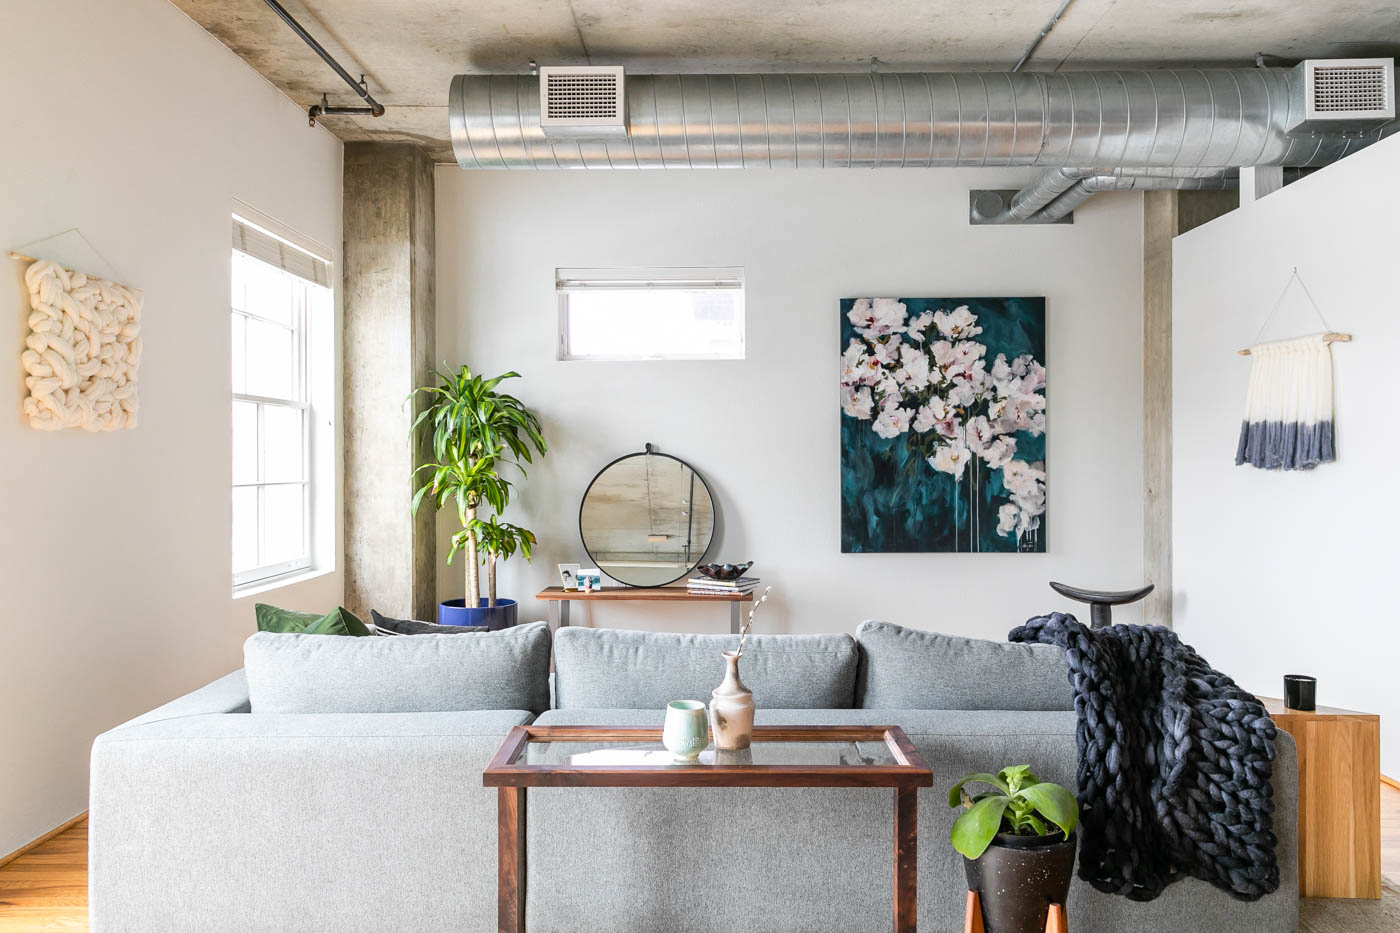 ArtistLoft-DenverCO-natural-light-photography-studio-lifestyle-photoshoot-location-editorial-commercial-photography-39.jpg